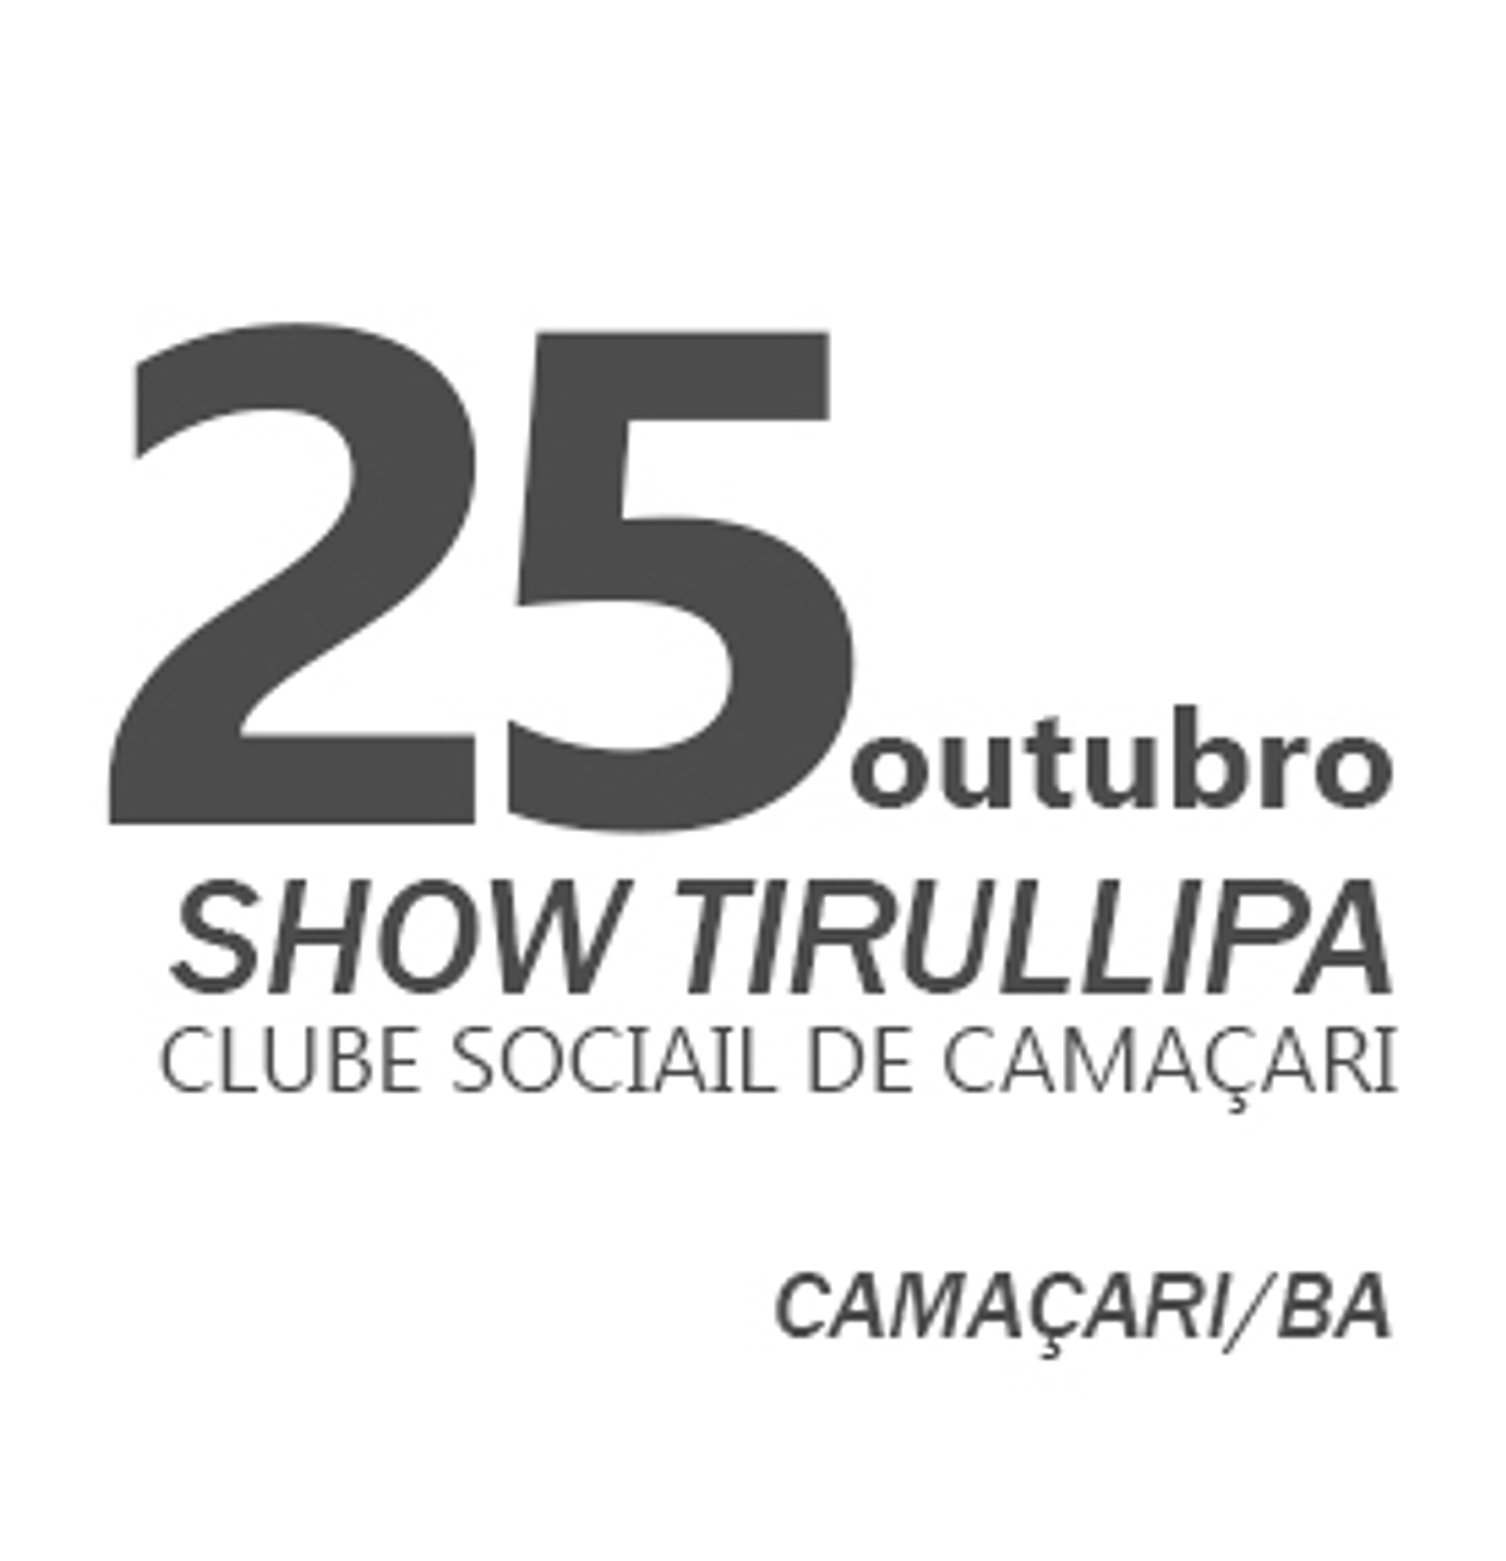 TIRULLIPA EM CAMAÇARI/BA